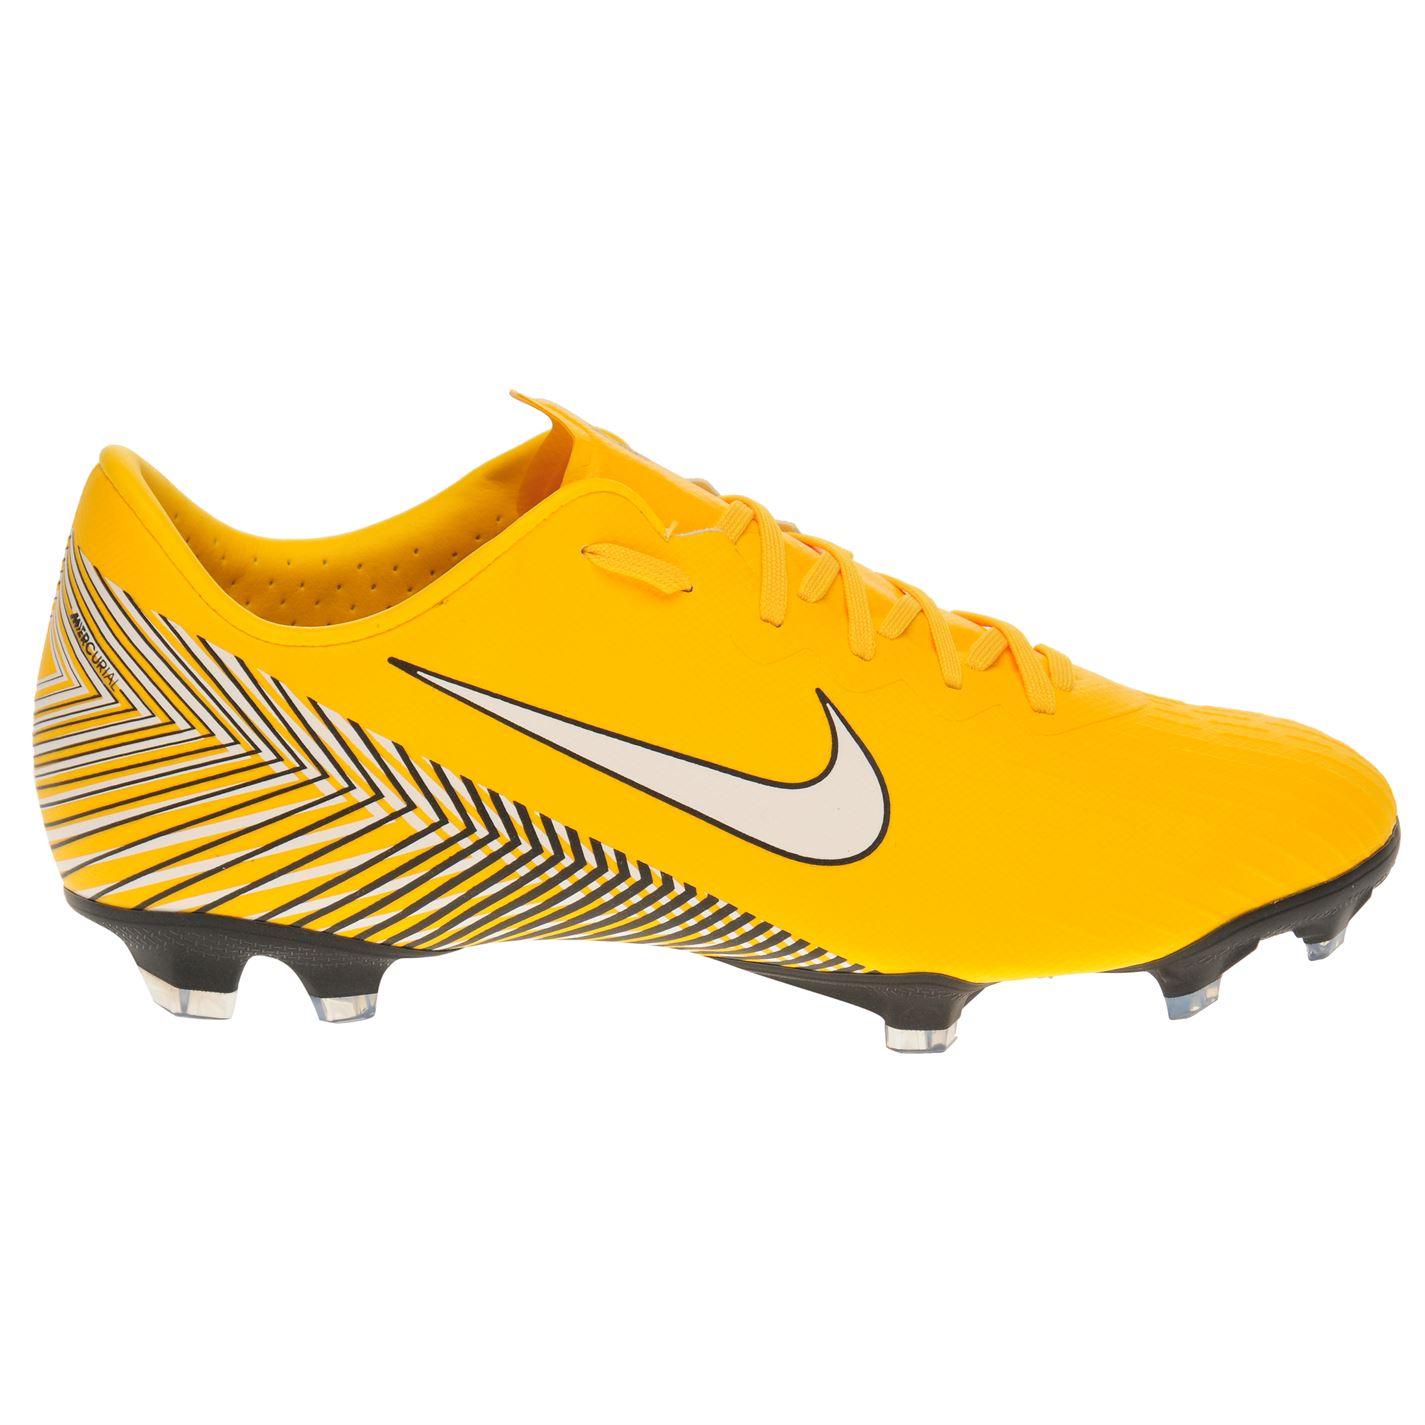 Nike Mercurial Vapor Elite Neymar Jr Junior FG Football Boots